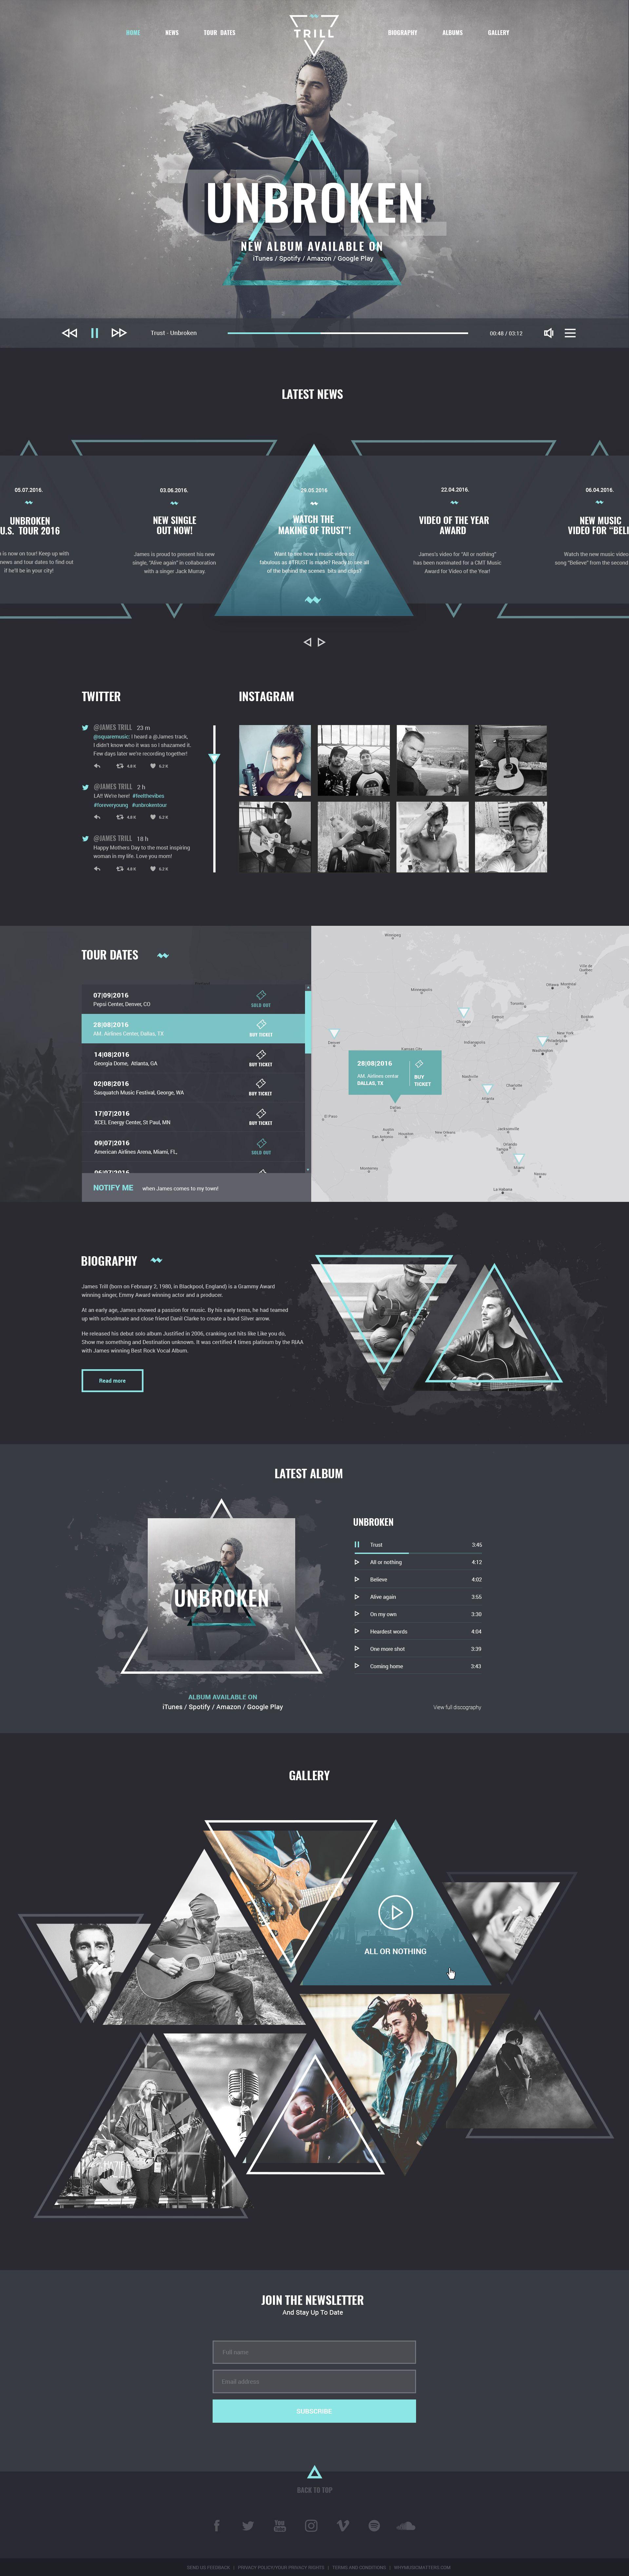 Trill Modern Psd Music Template For Bands Musicians Website Design Layout Web App Design Web Template Design